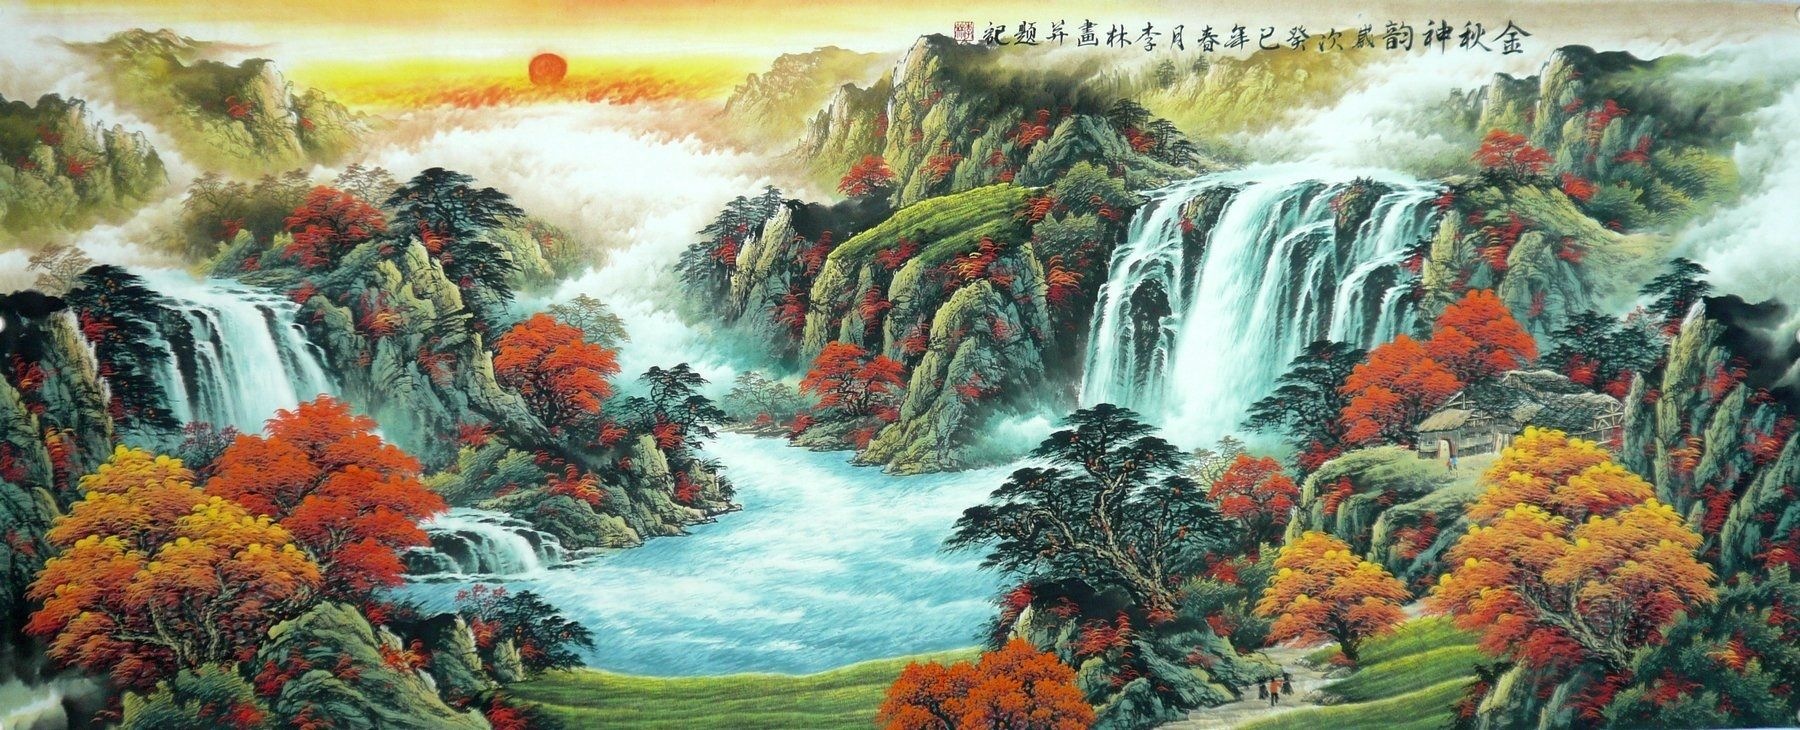 Golden Autumn Cornucopia Sunrise or Sunset Waterfall Landscape